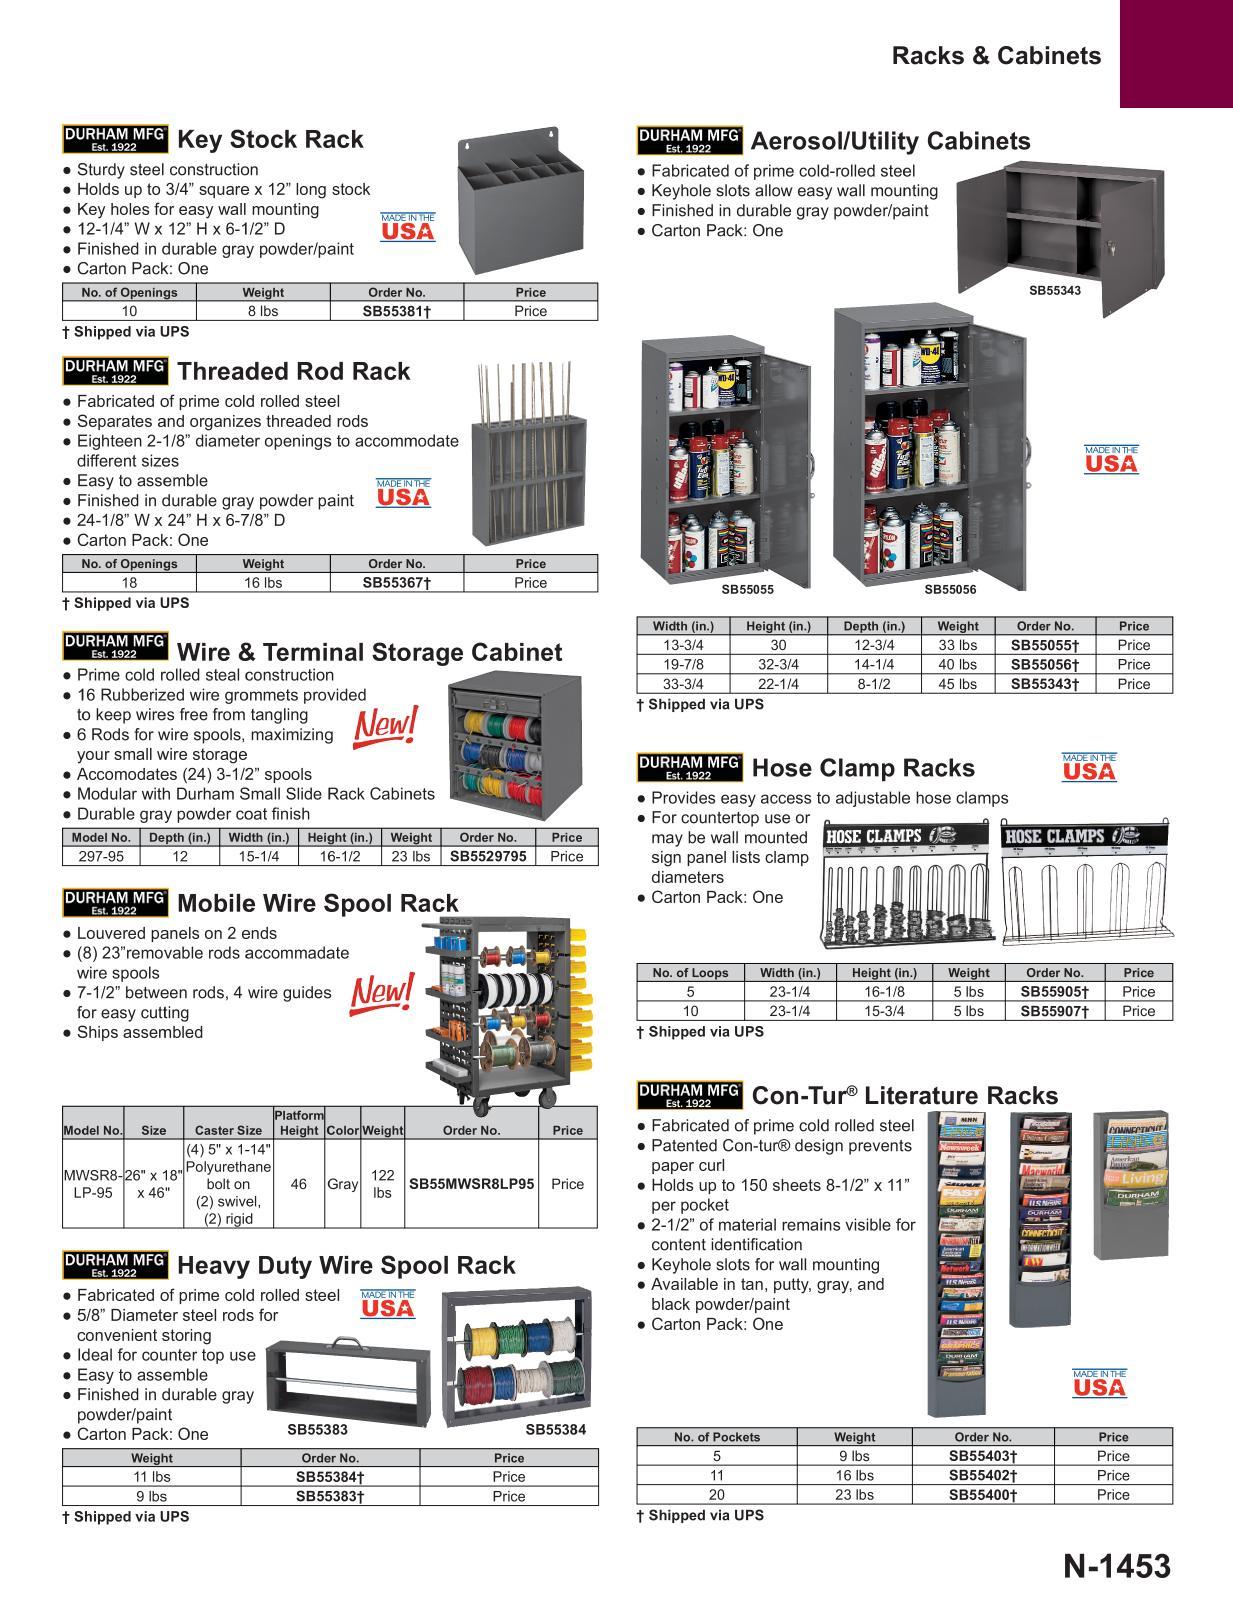 Material Handling - 2017 Master Catalog Page 1453